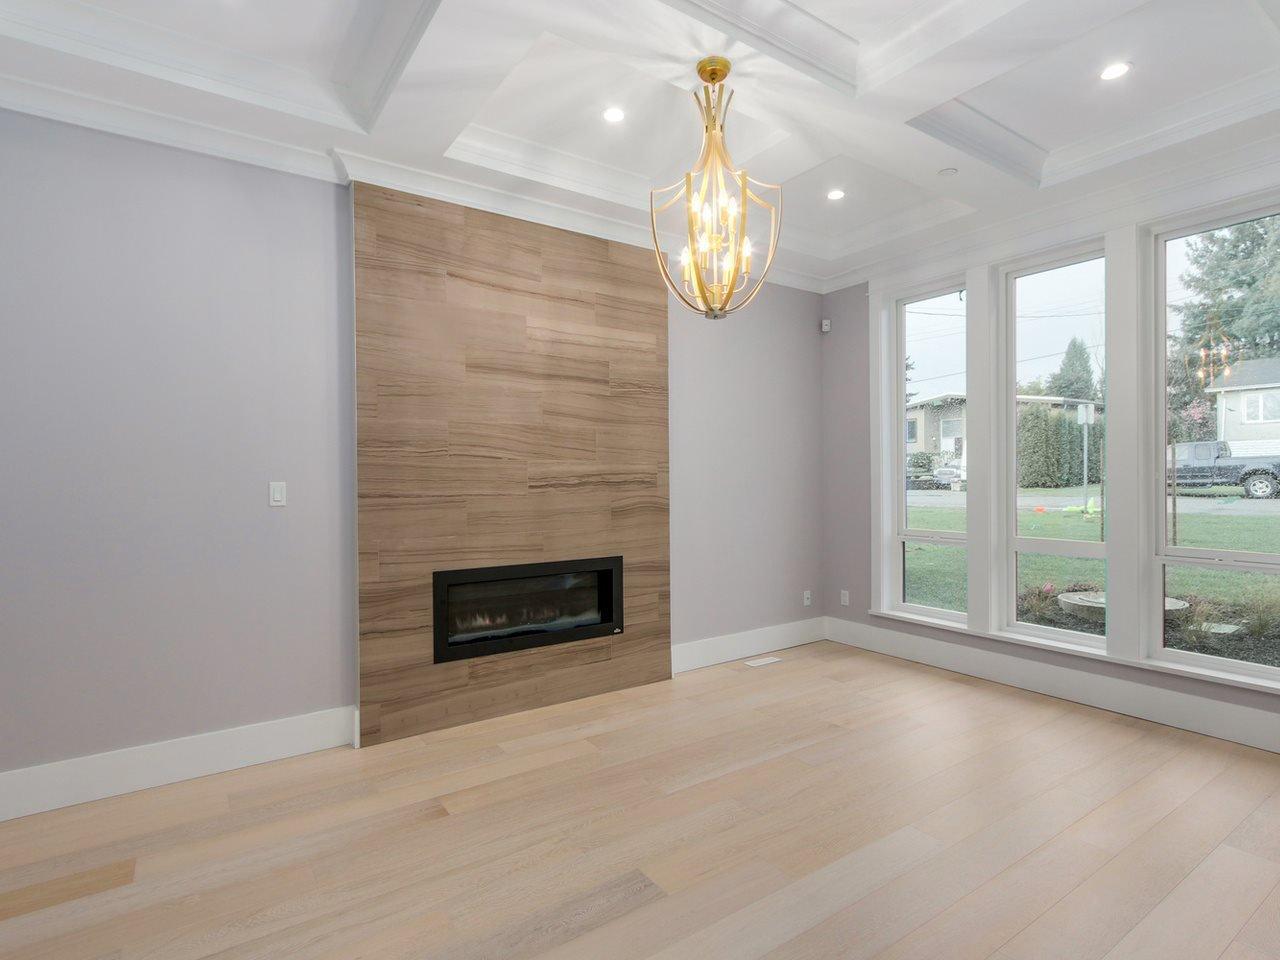 Photo 2: Photos: 1560 MAPLE Street: White Rock House for sale (South Surrey White Rock)  : MLS®# R2138926